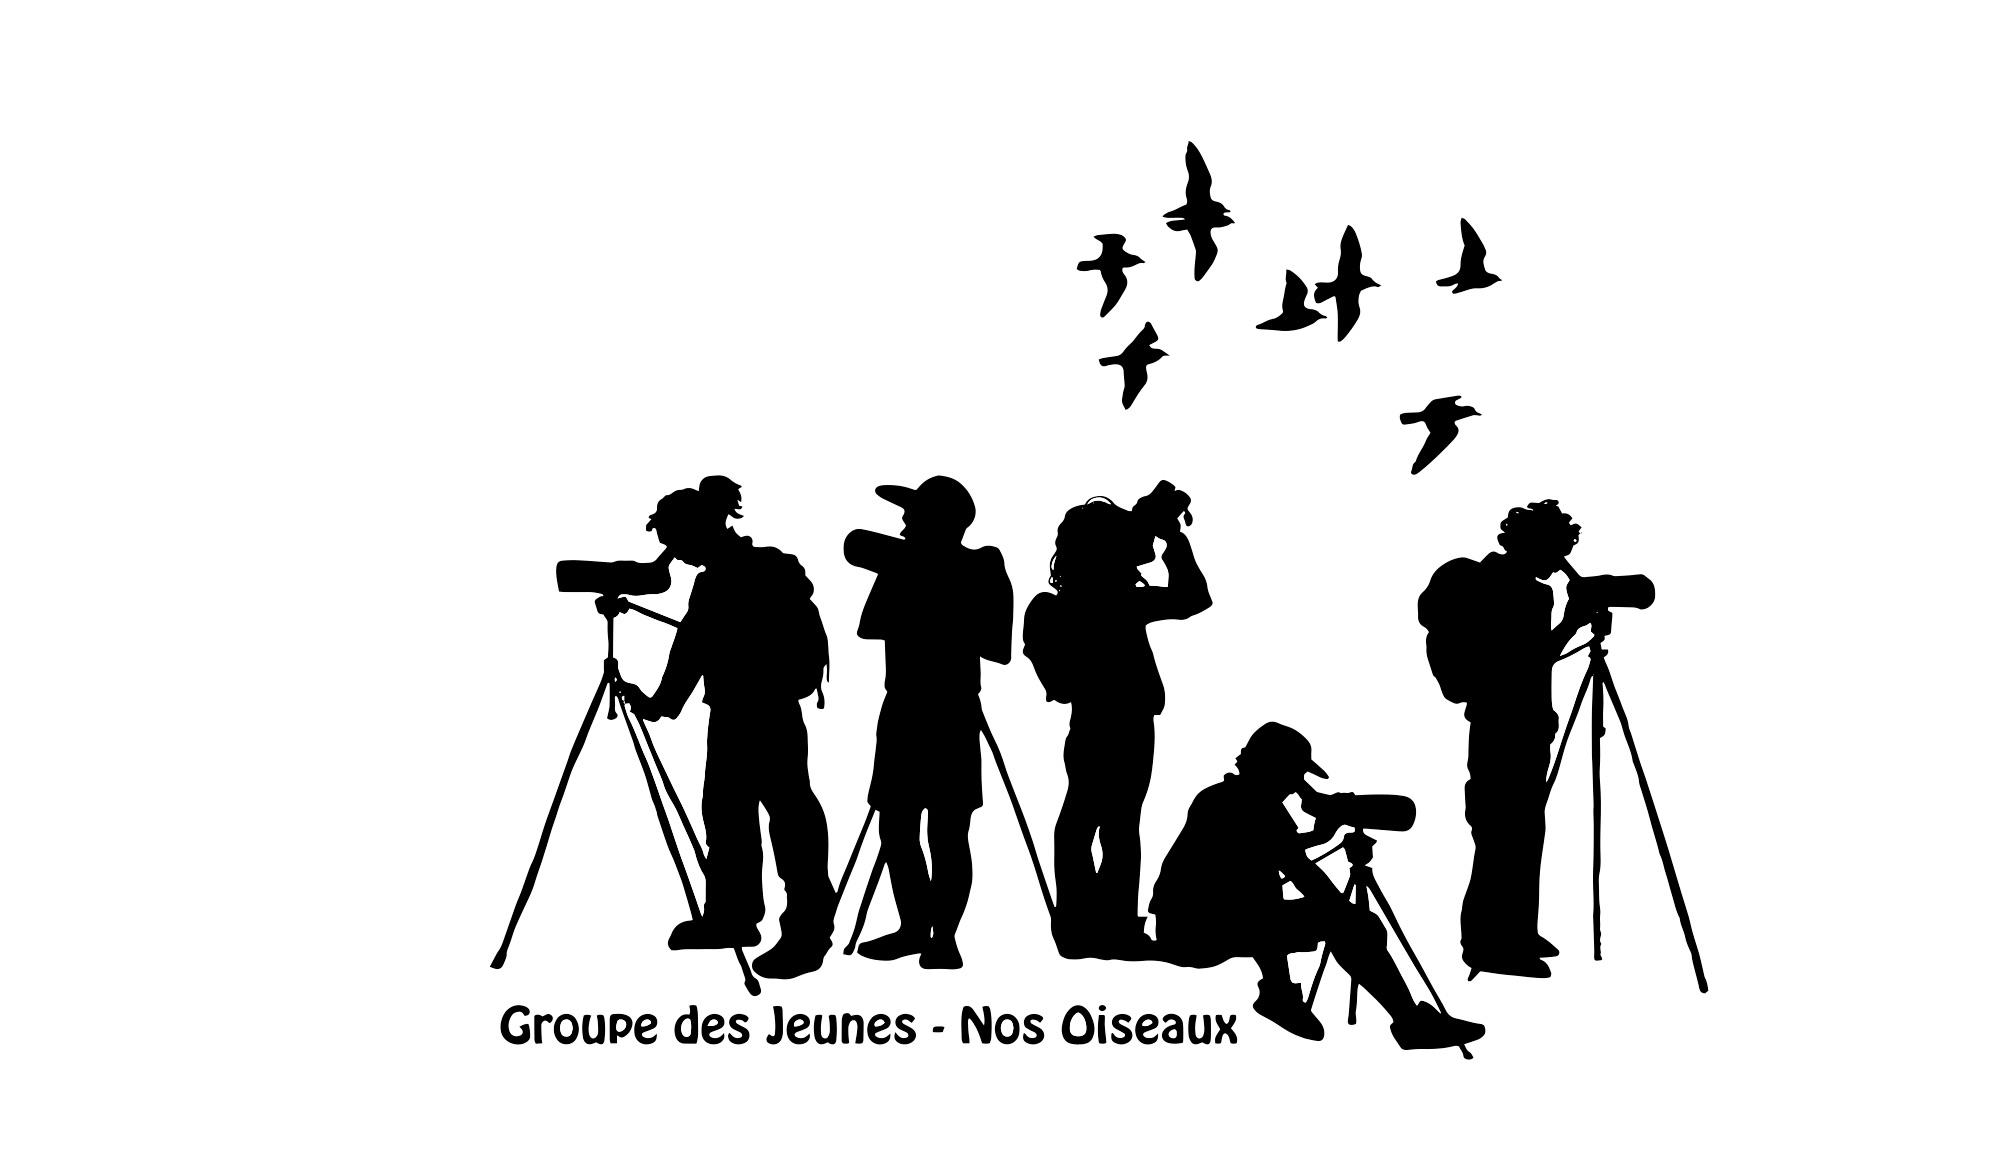 https://cdnfiles1.biolovision.net/gdj.nosoiseaux.ch/userfiles/GDJLogo.jpg